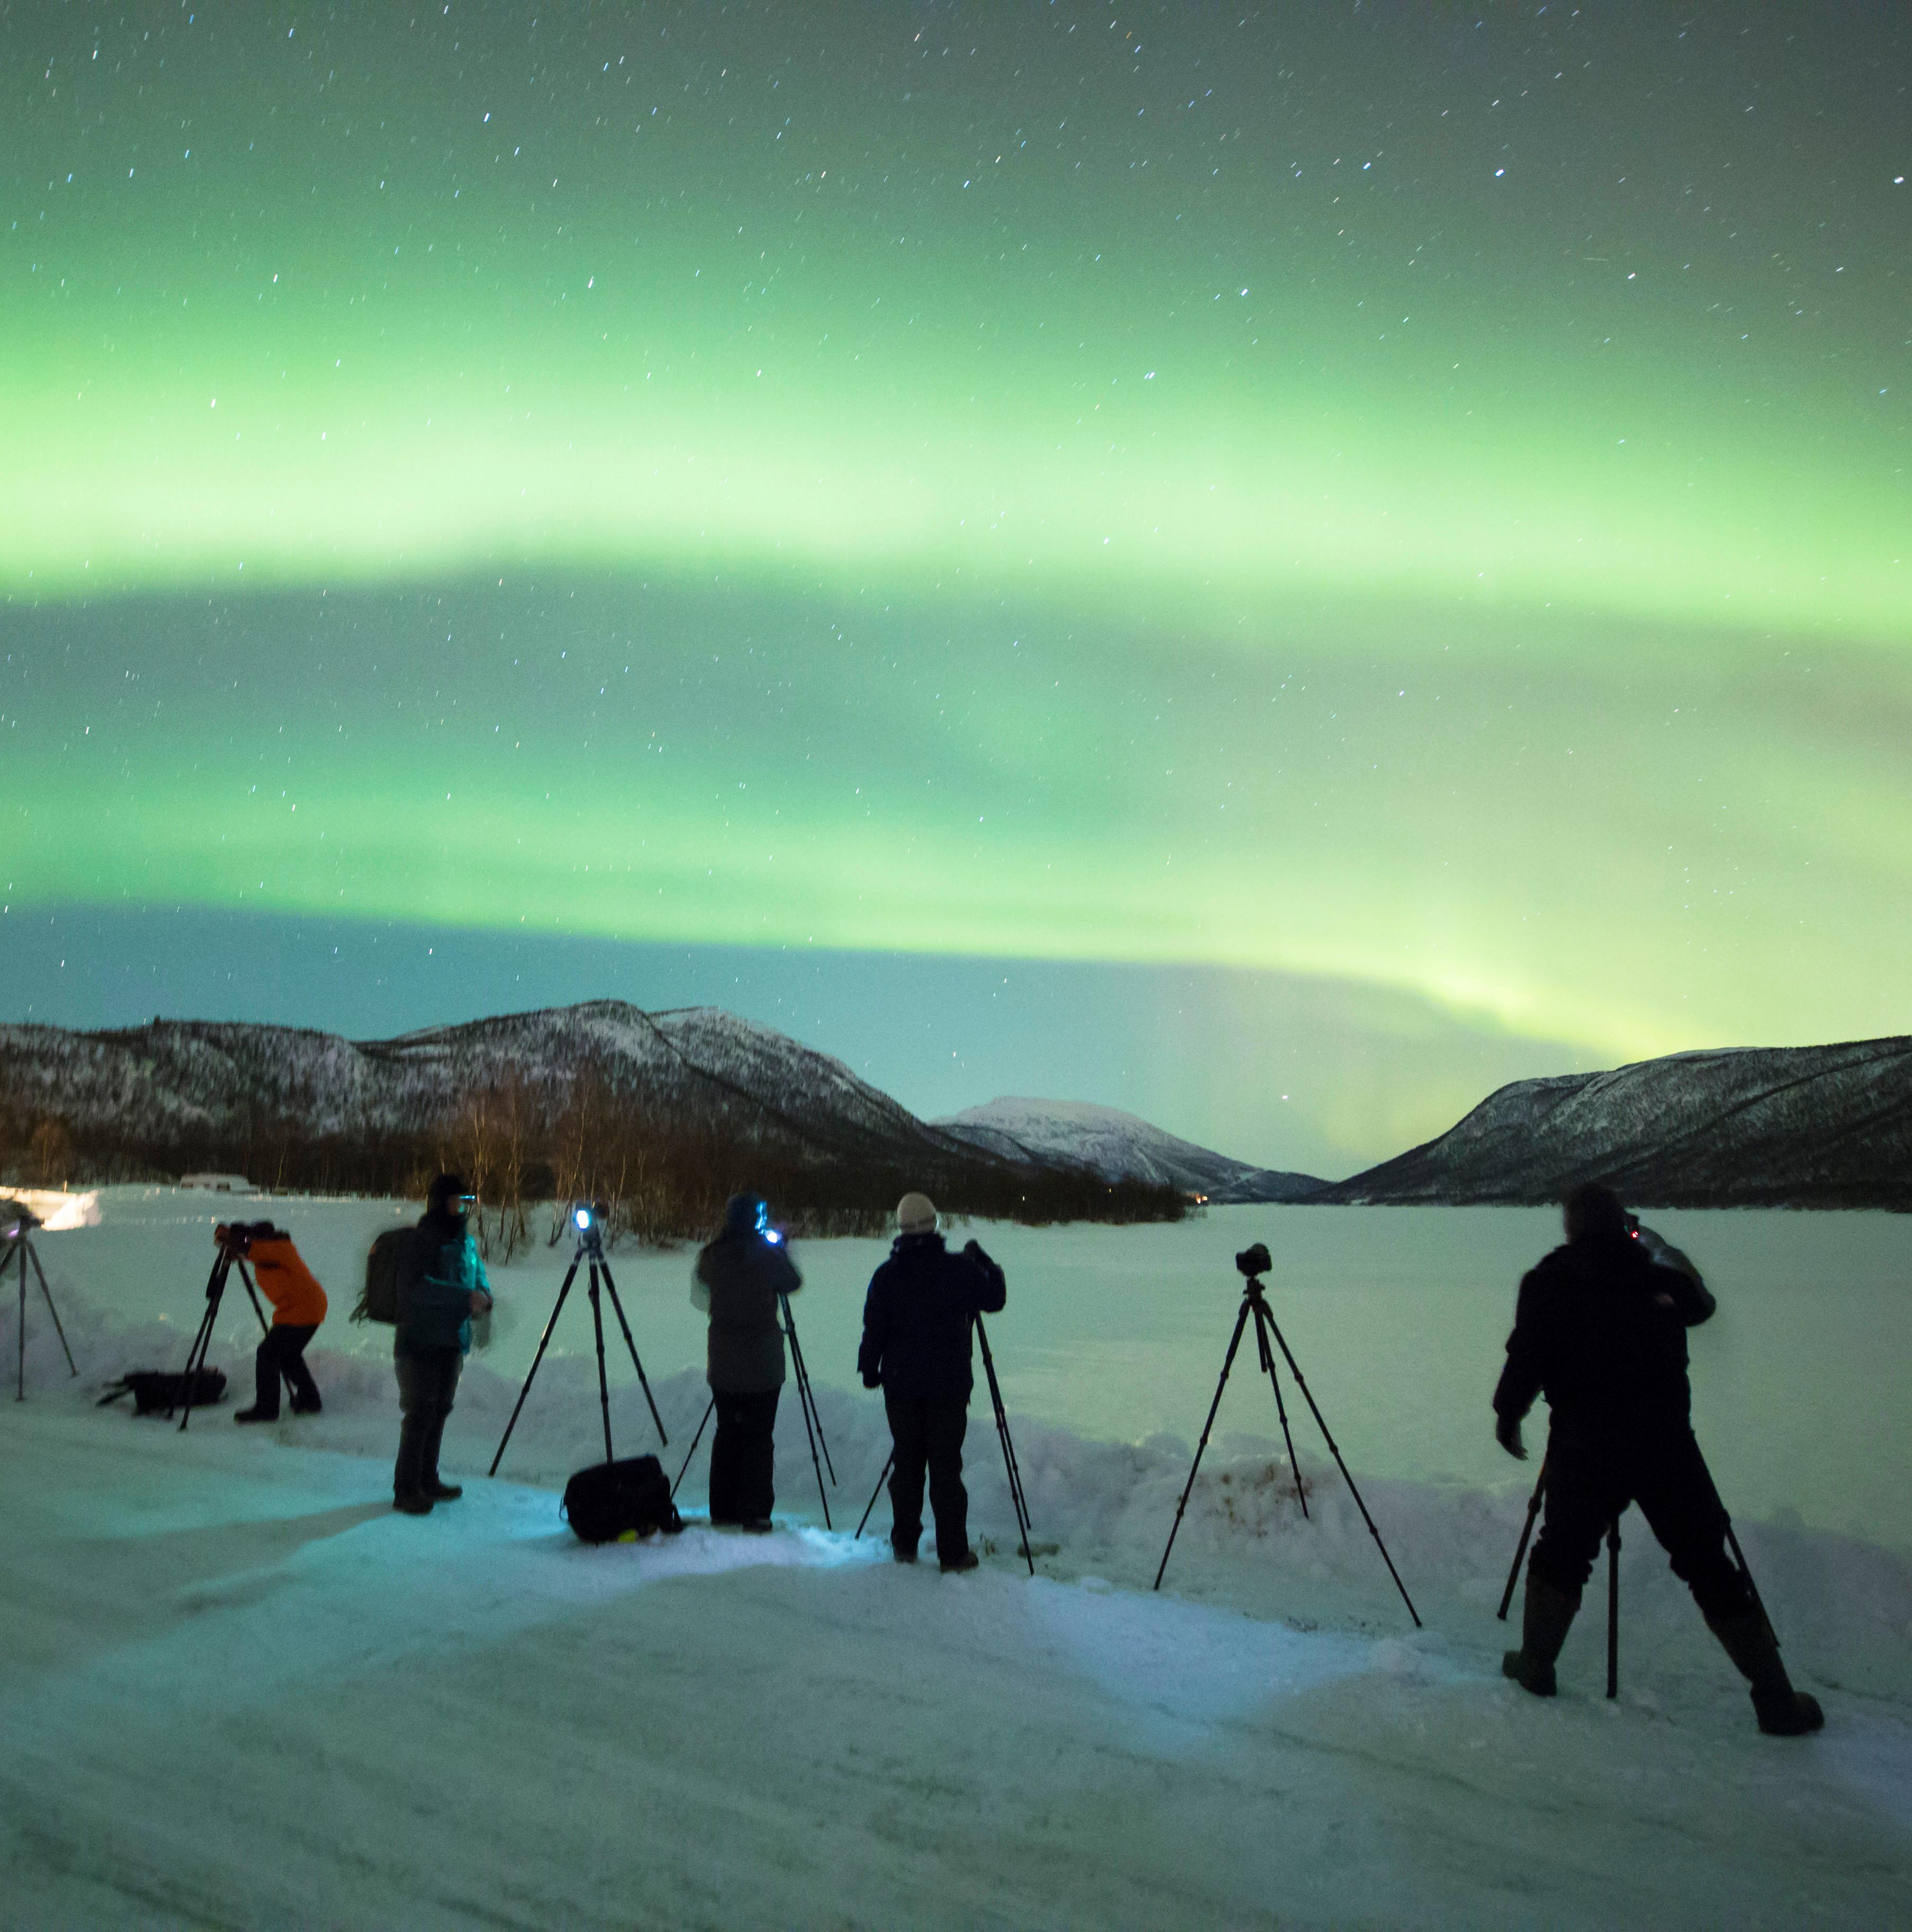 Night Photography Field Workshop